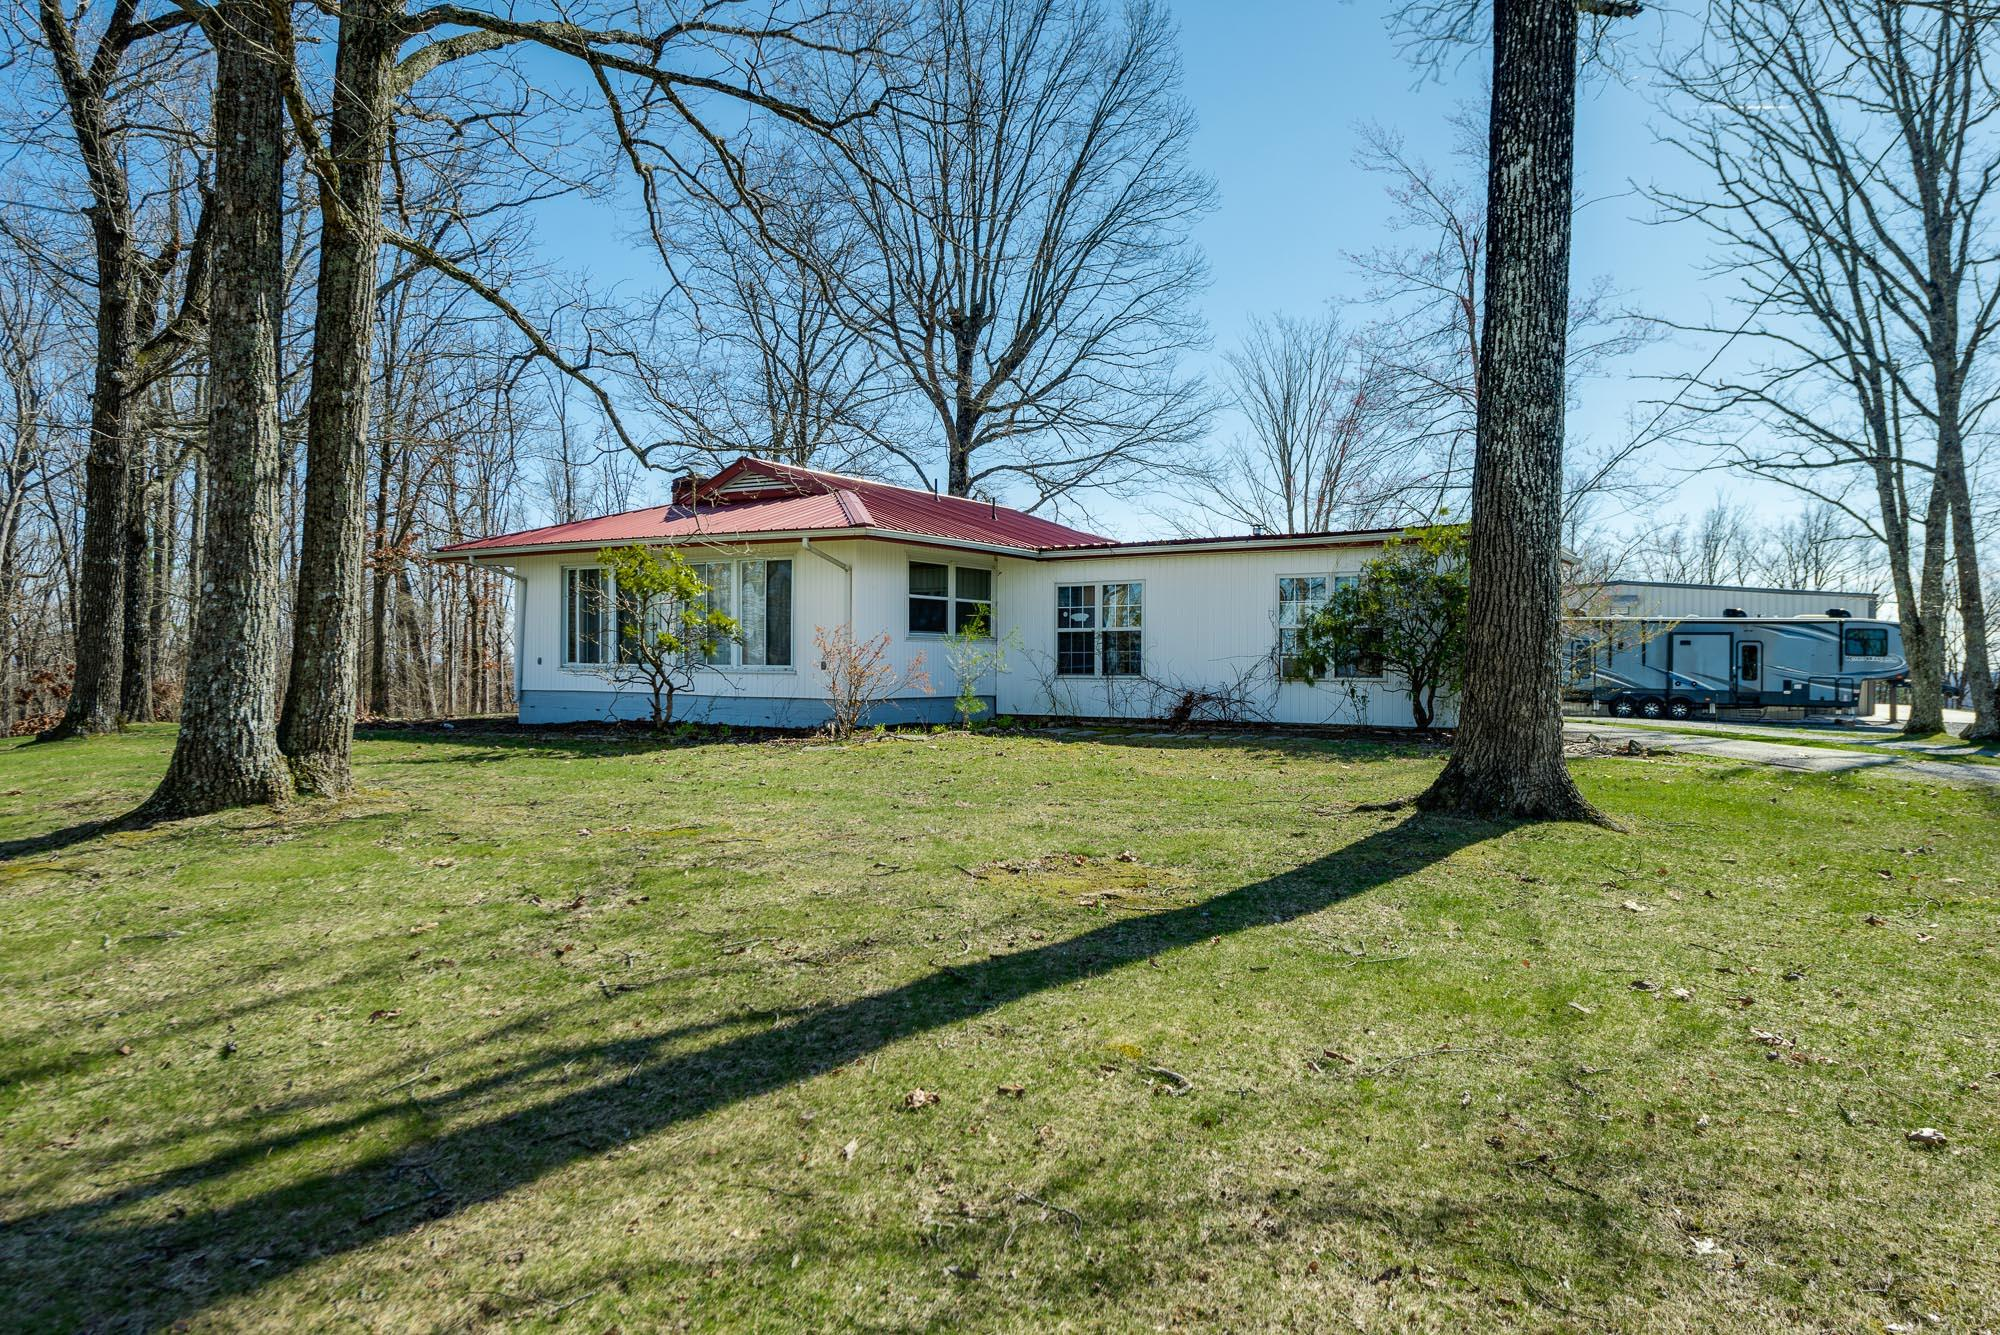 1079 Bristow Rd, Crossville, TN 38571 - Crossville, TN real estate listing